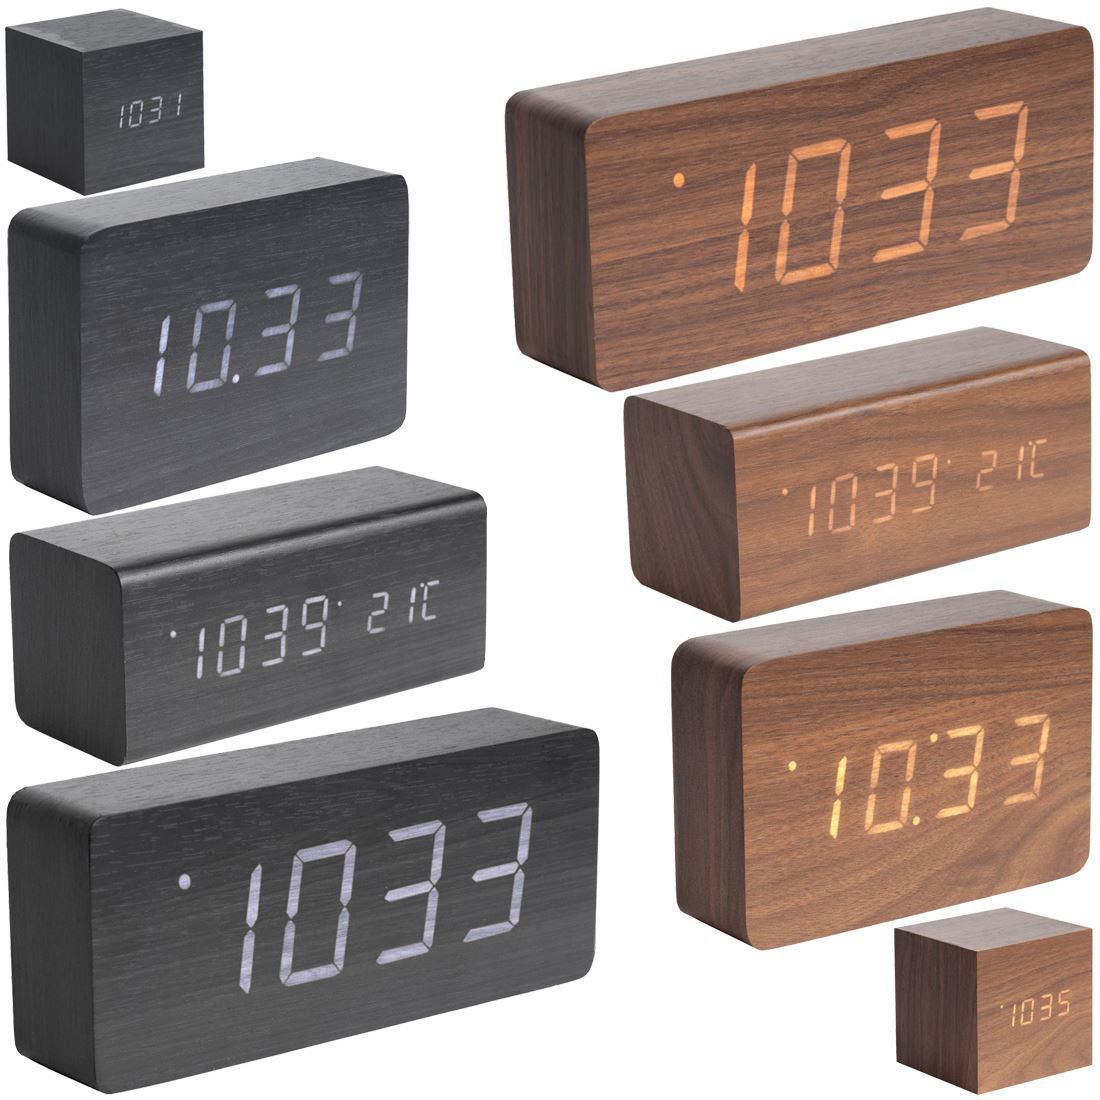 Karlsson wood block alarm clock date and temperature minimalist table clock